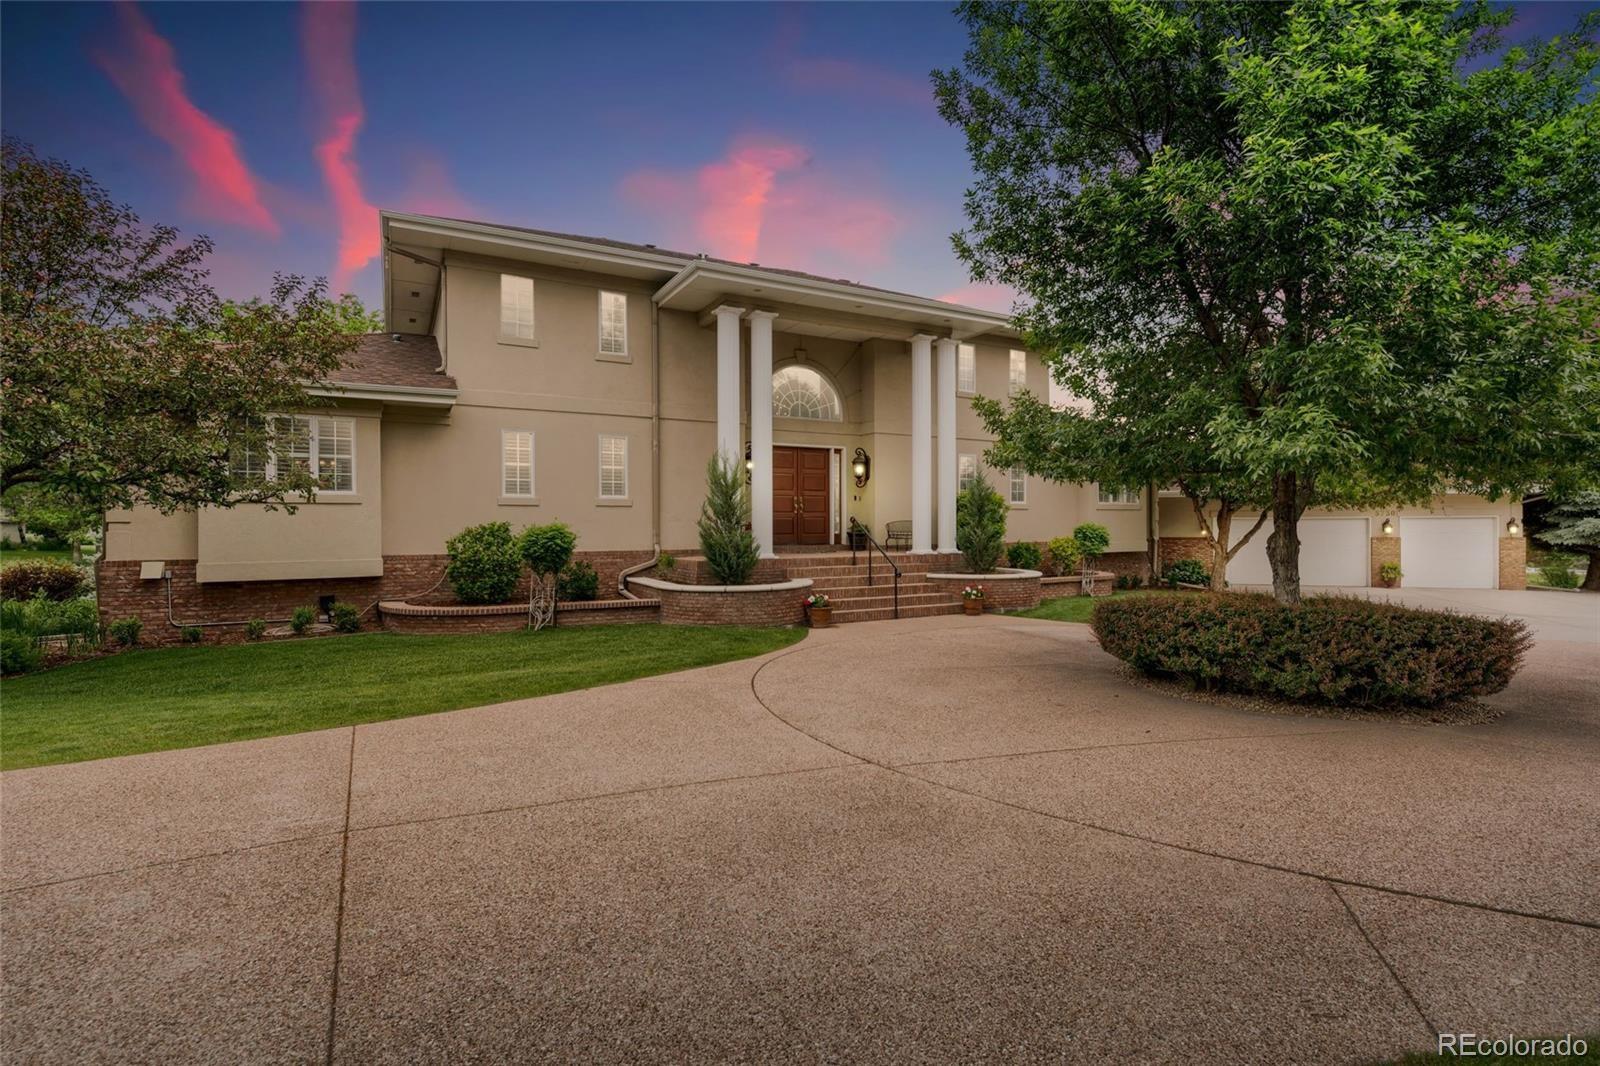 MLS# 2964584 - 3 - 5730 Ridgeway Drive, Fort Collins, CO 80528